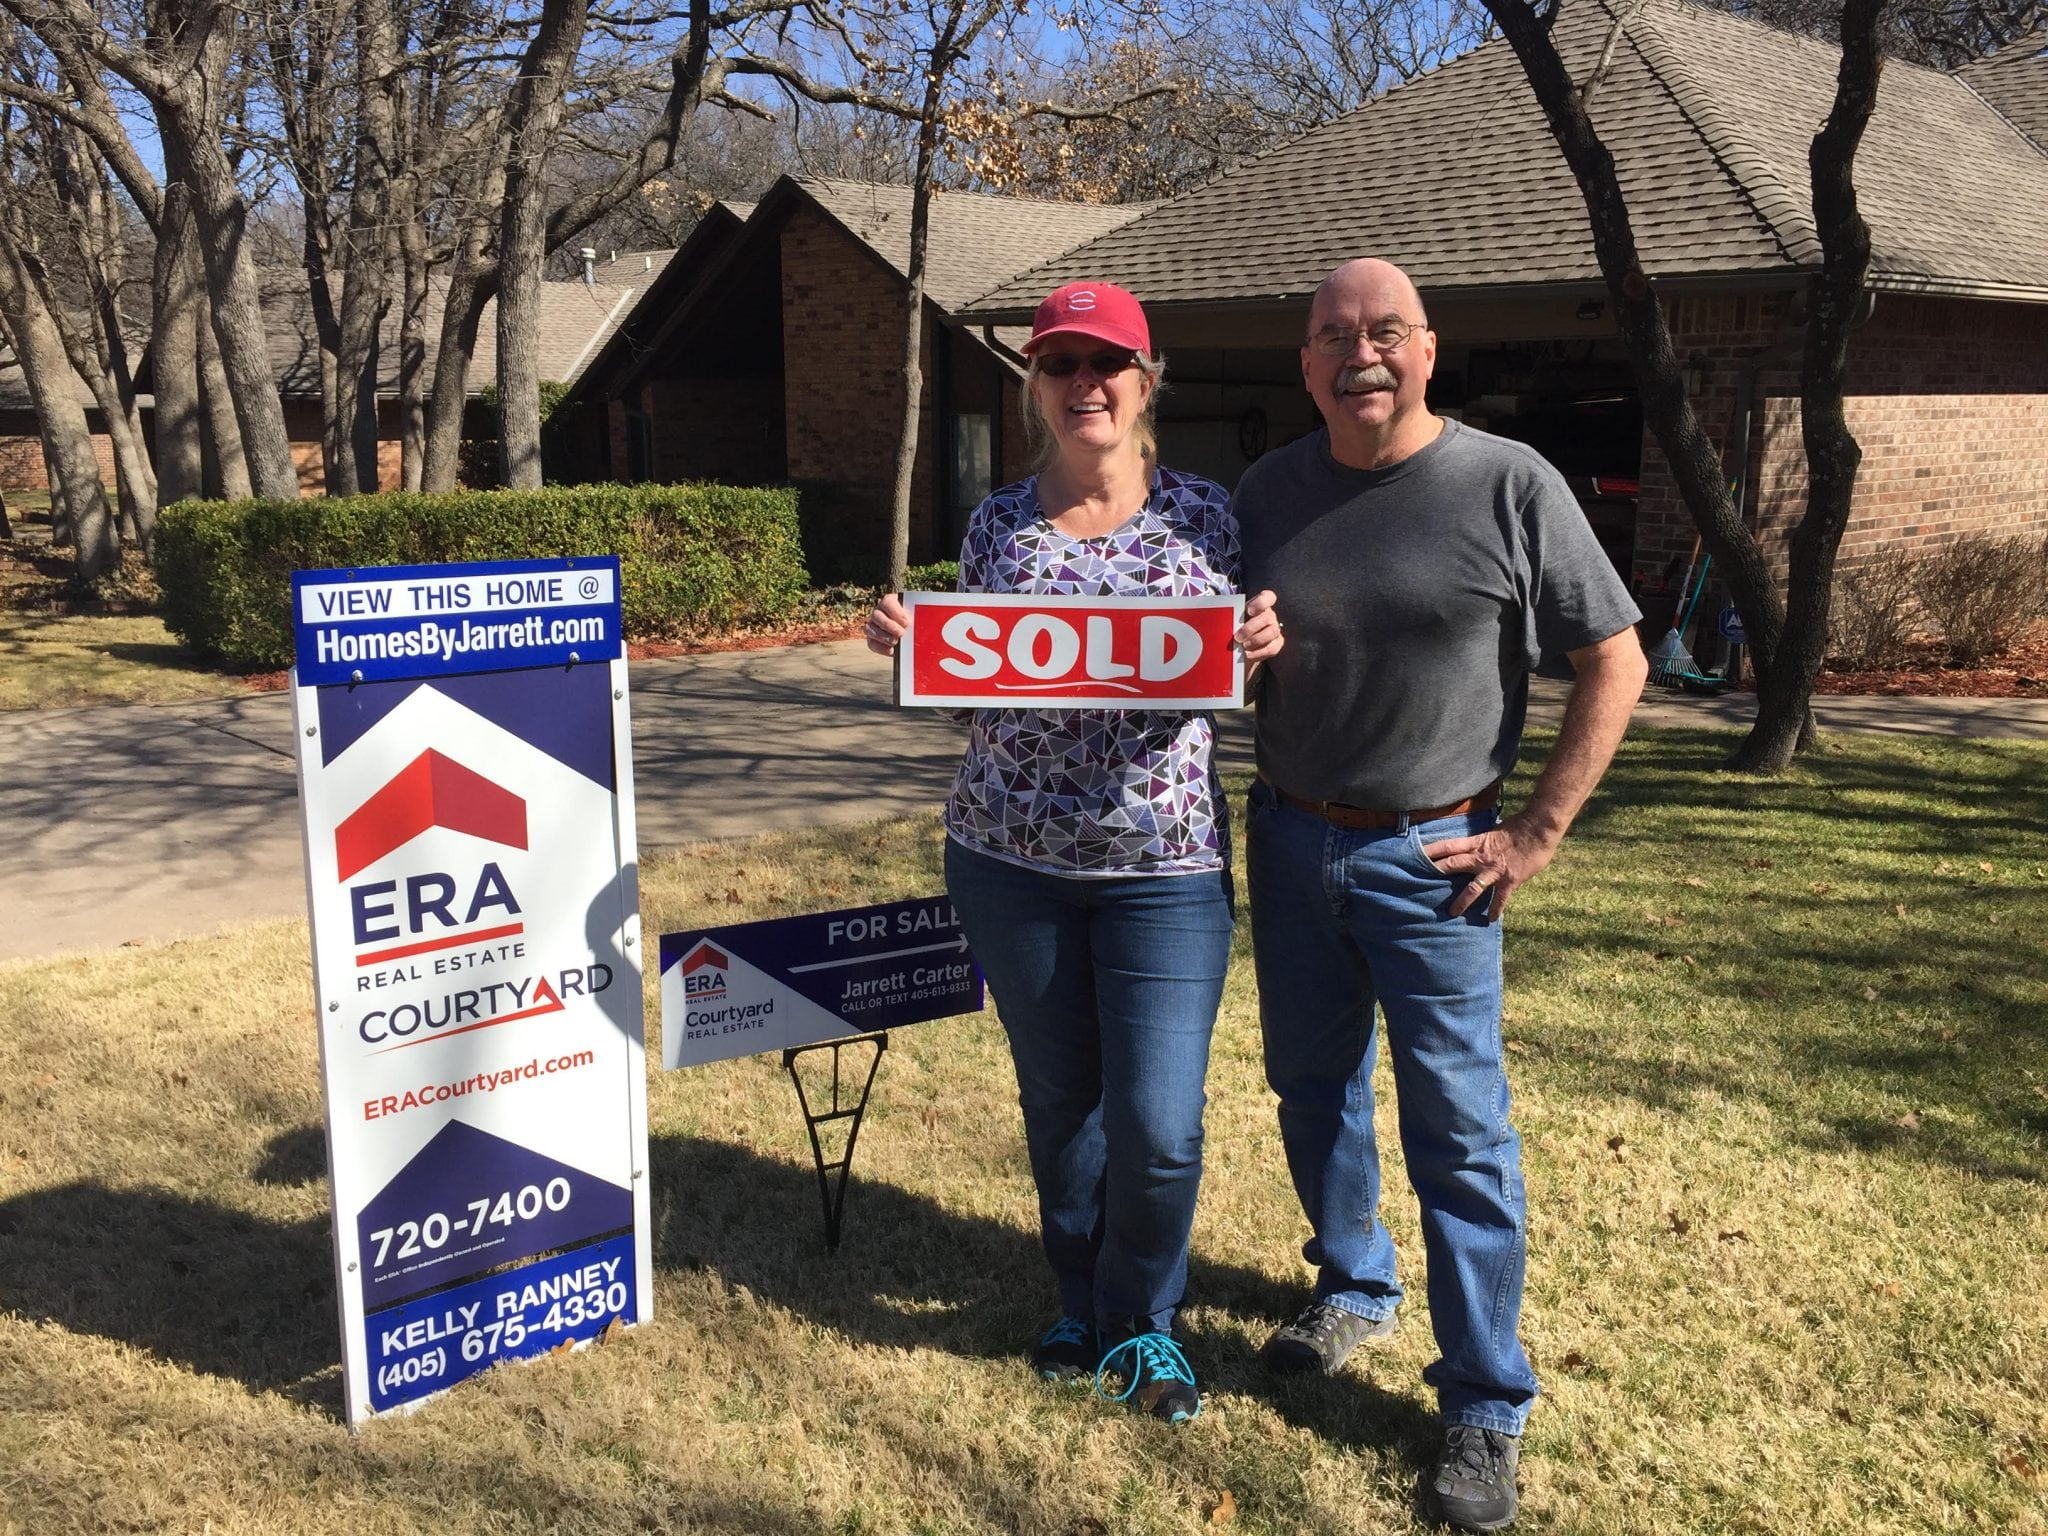 Property sold by Jarrett Carter